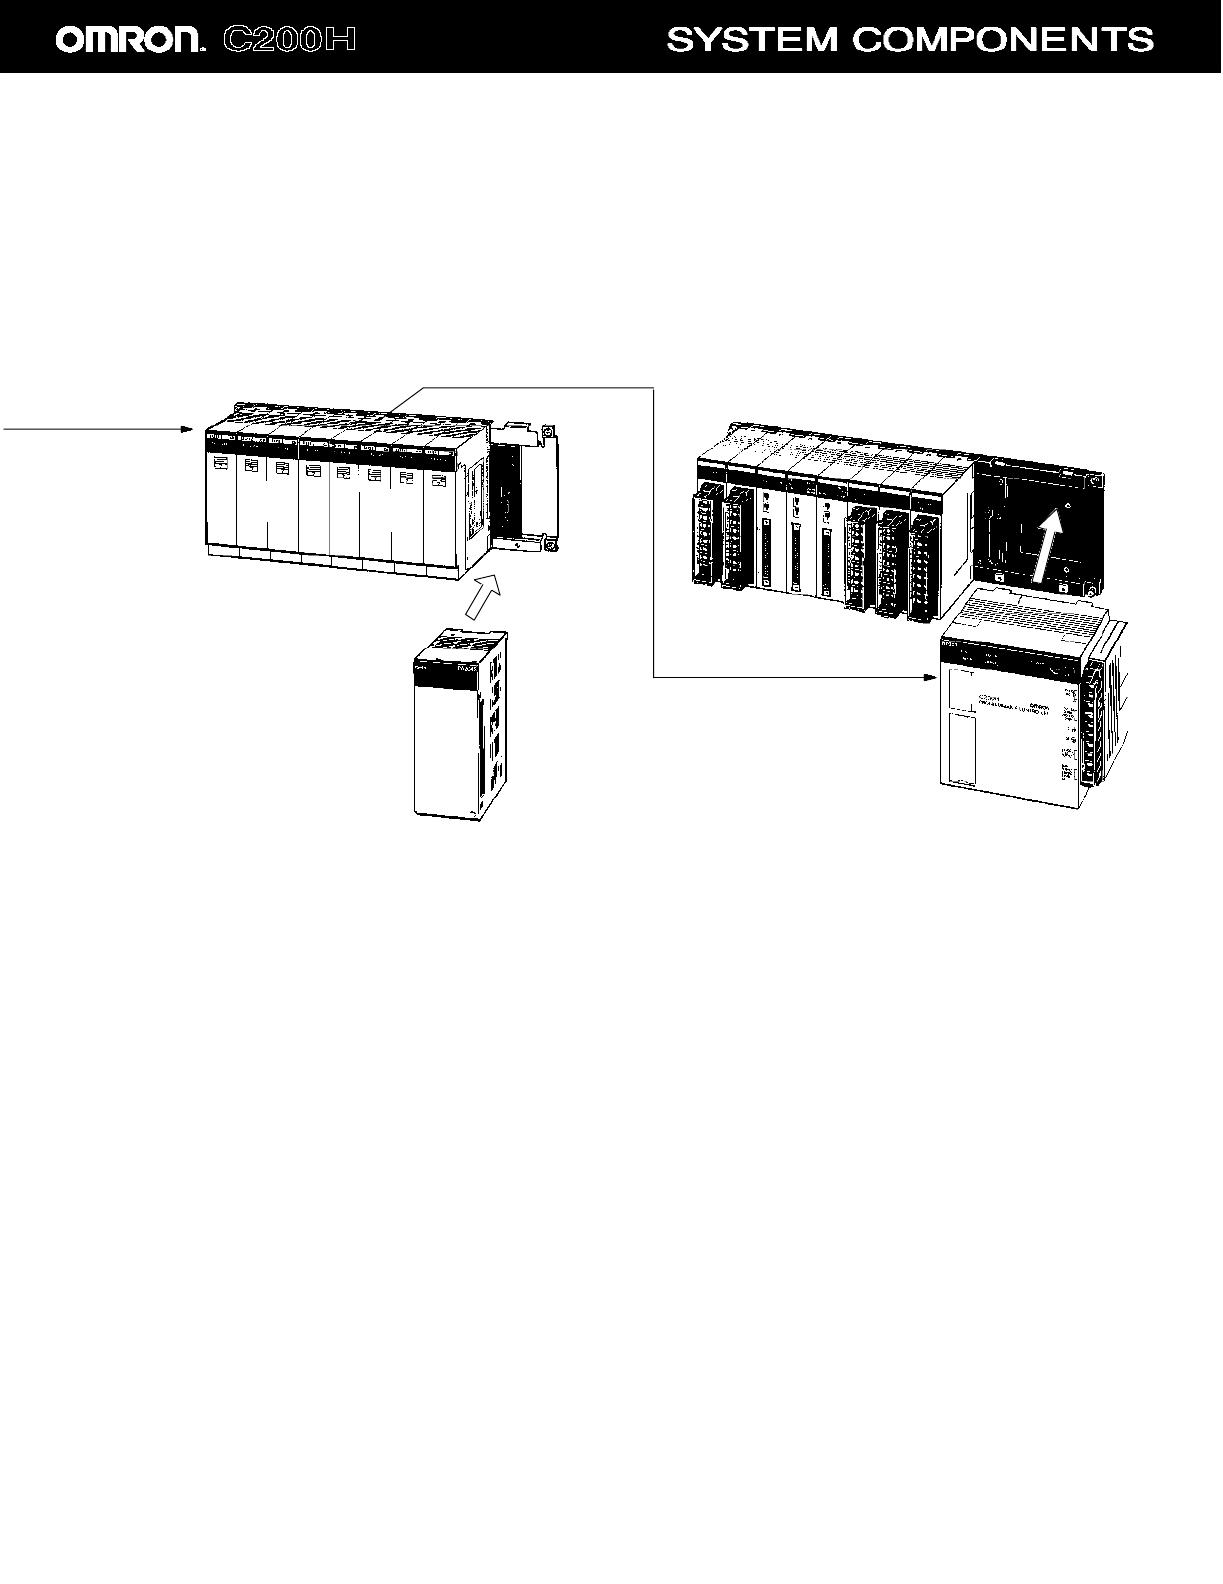 C200HX CPU44 E Omron C200H System Overview Computer